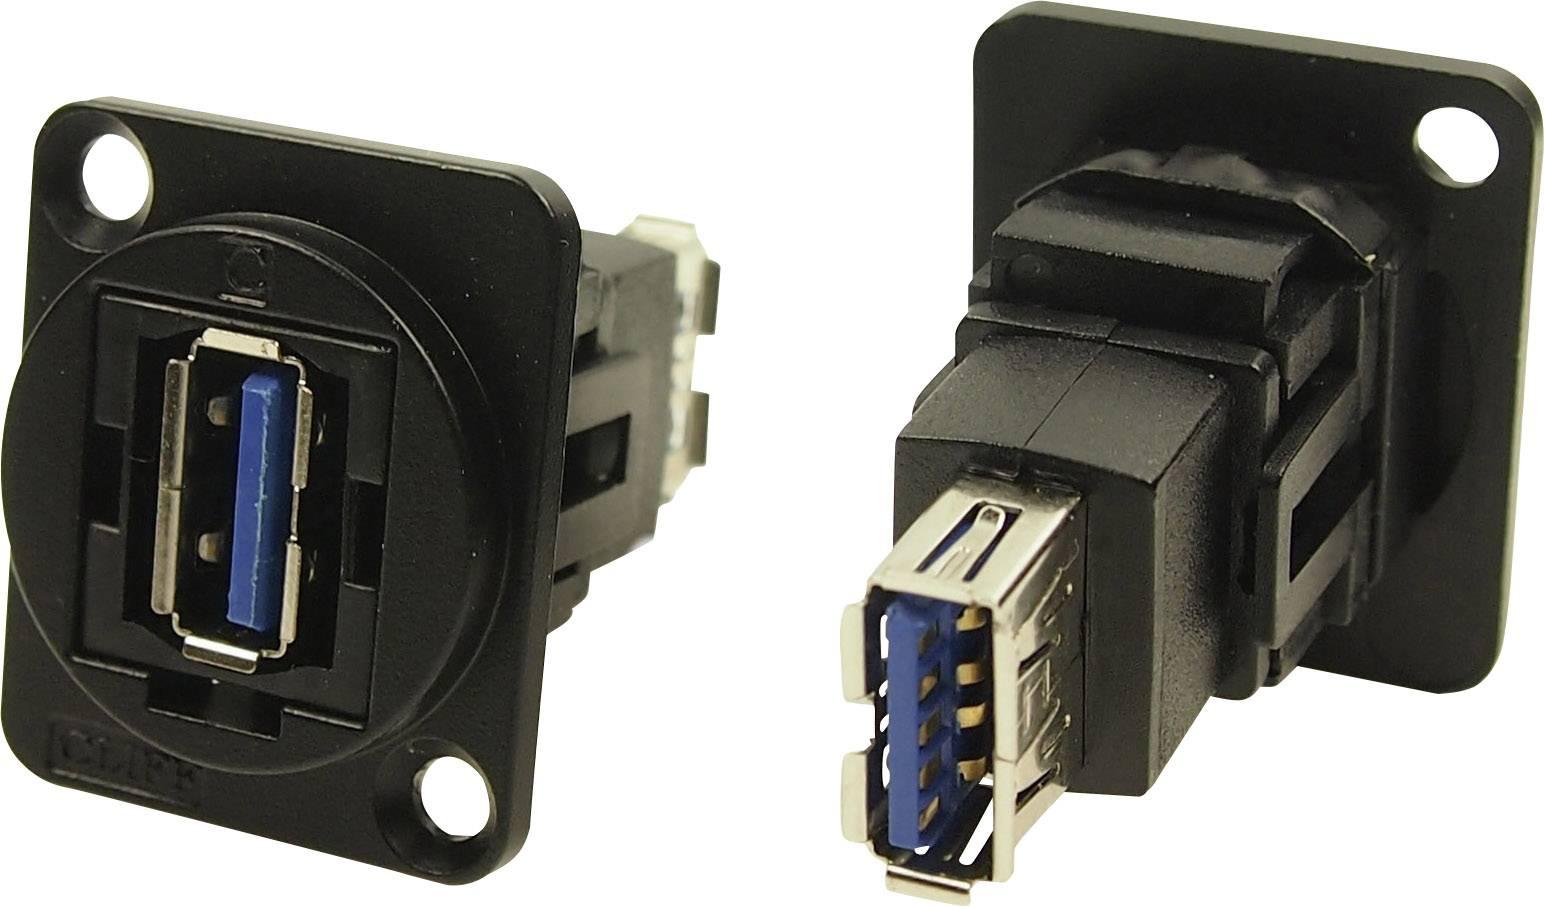 XLR Adapter USB A Buchse 3.0 auf USB A Buchse 3.0 Adapter Einbau CP30205NM